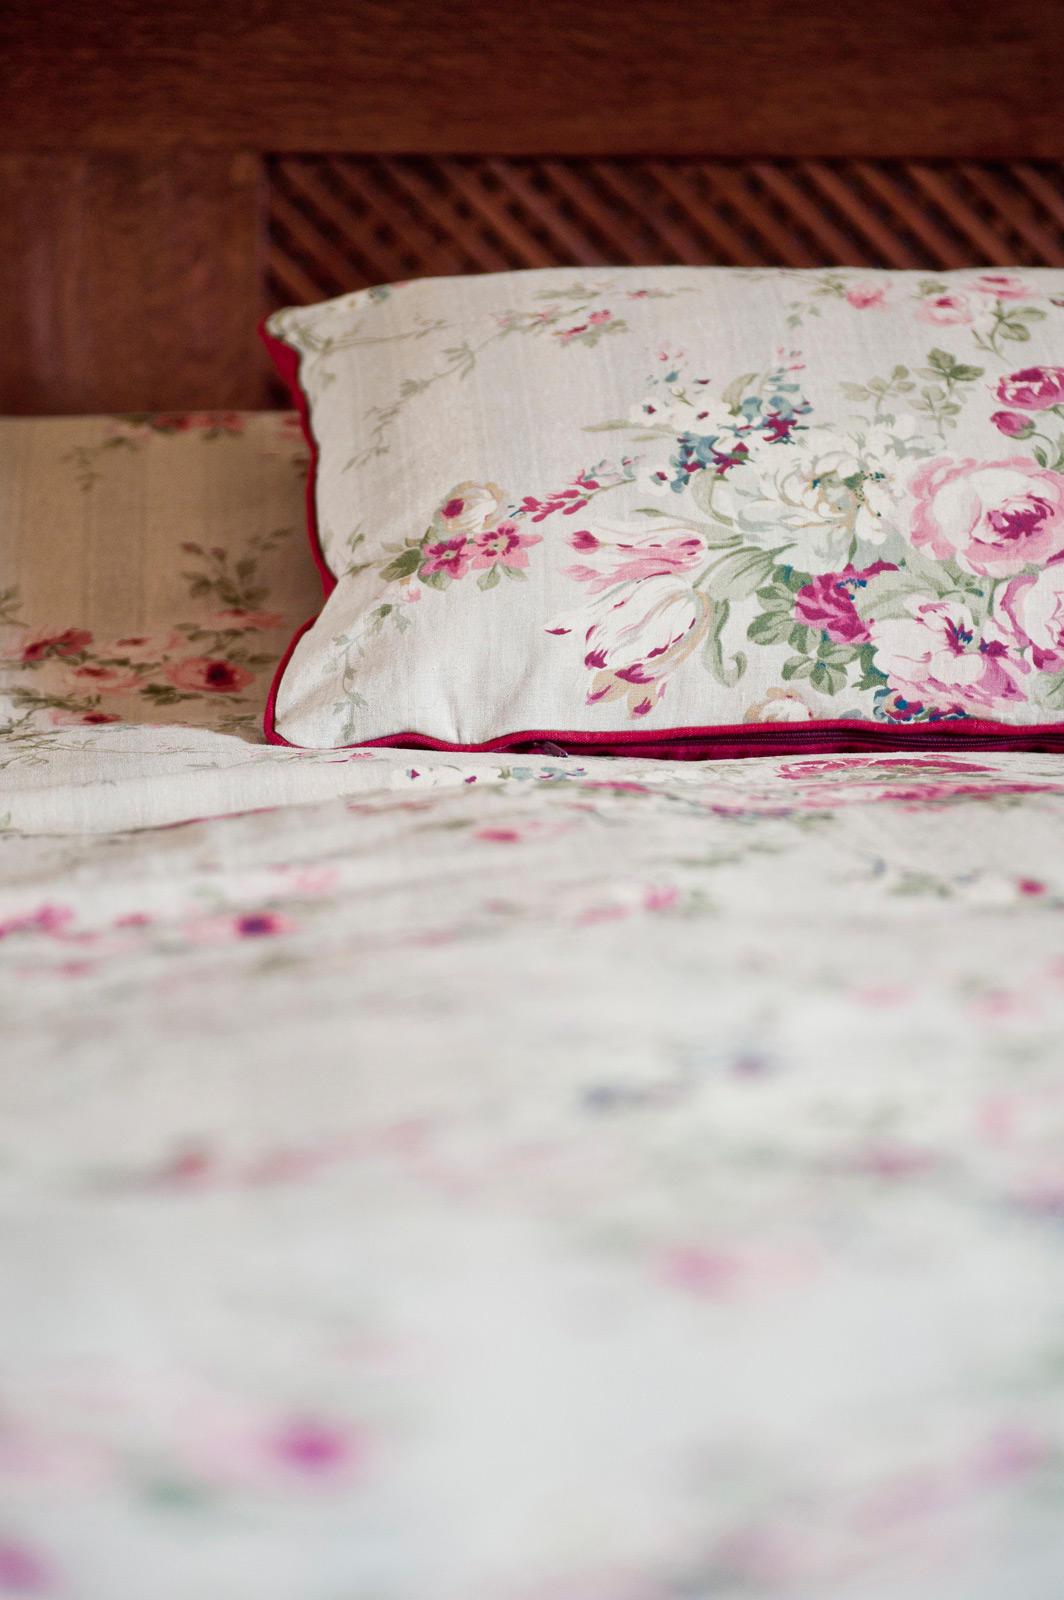 Kamerijck Bed and Breakfast